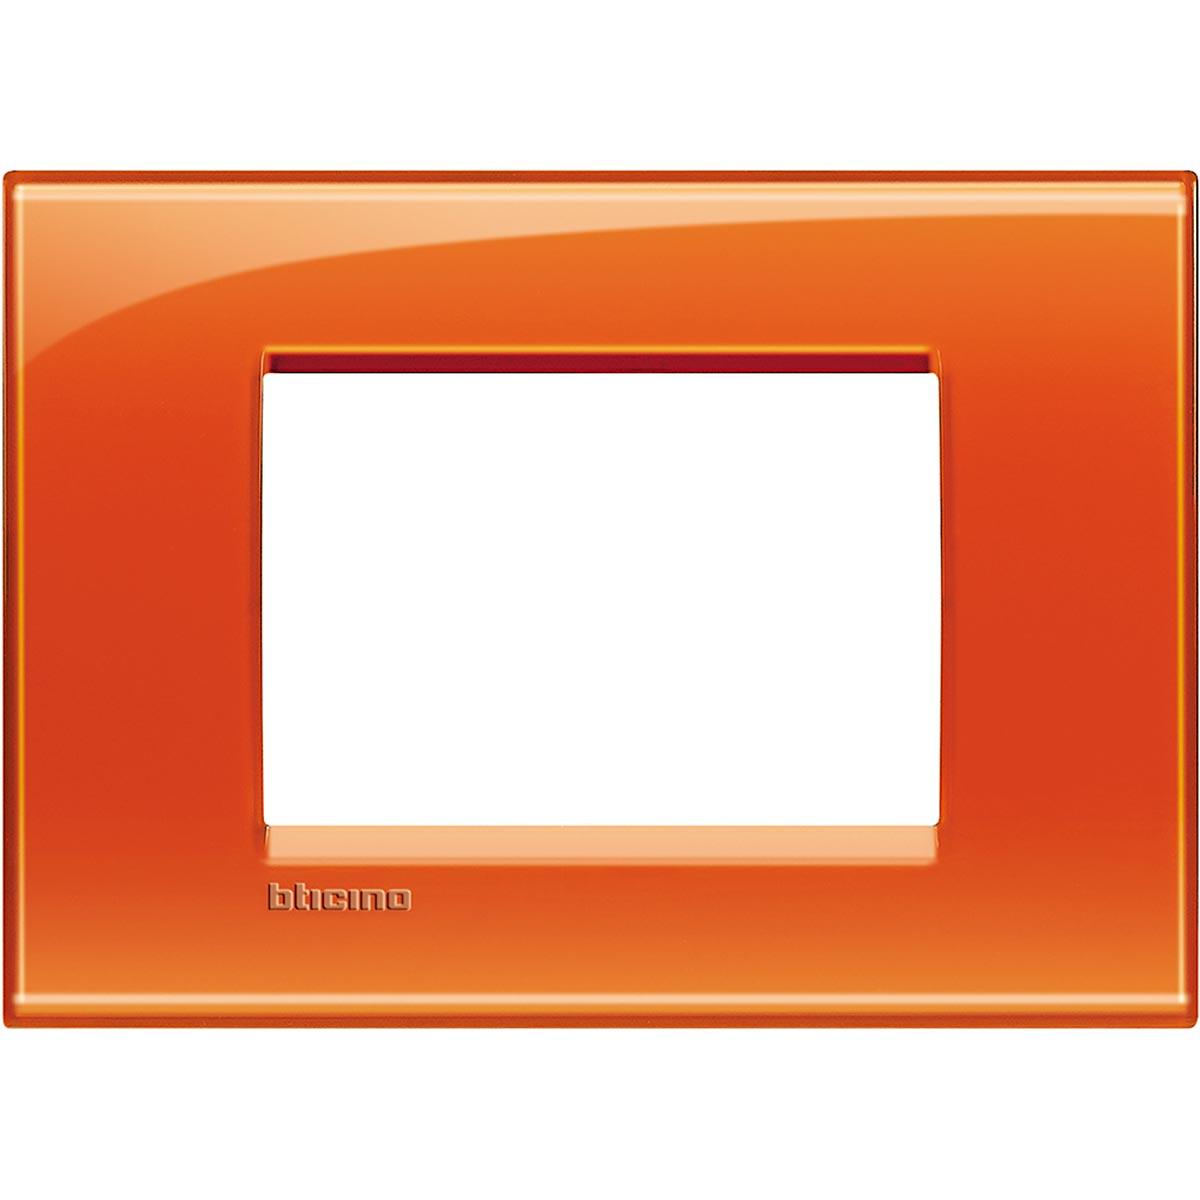 Placca 3 Moduli Arancio Deep Bticino Living International LNA4803OD